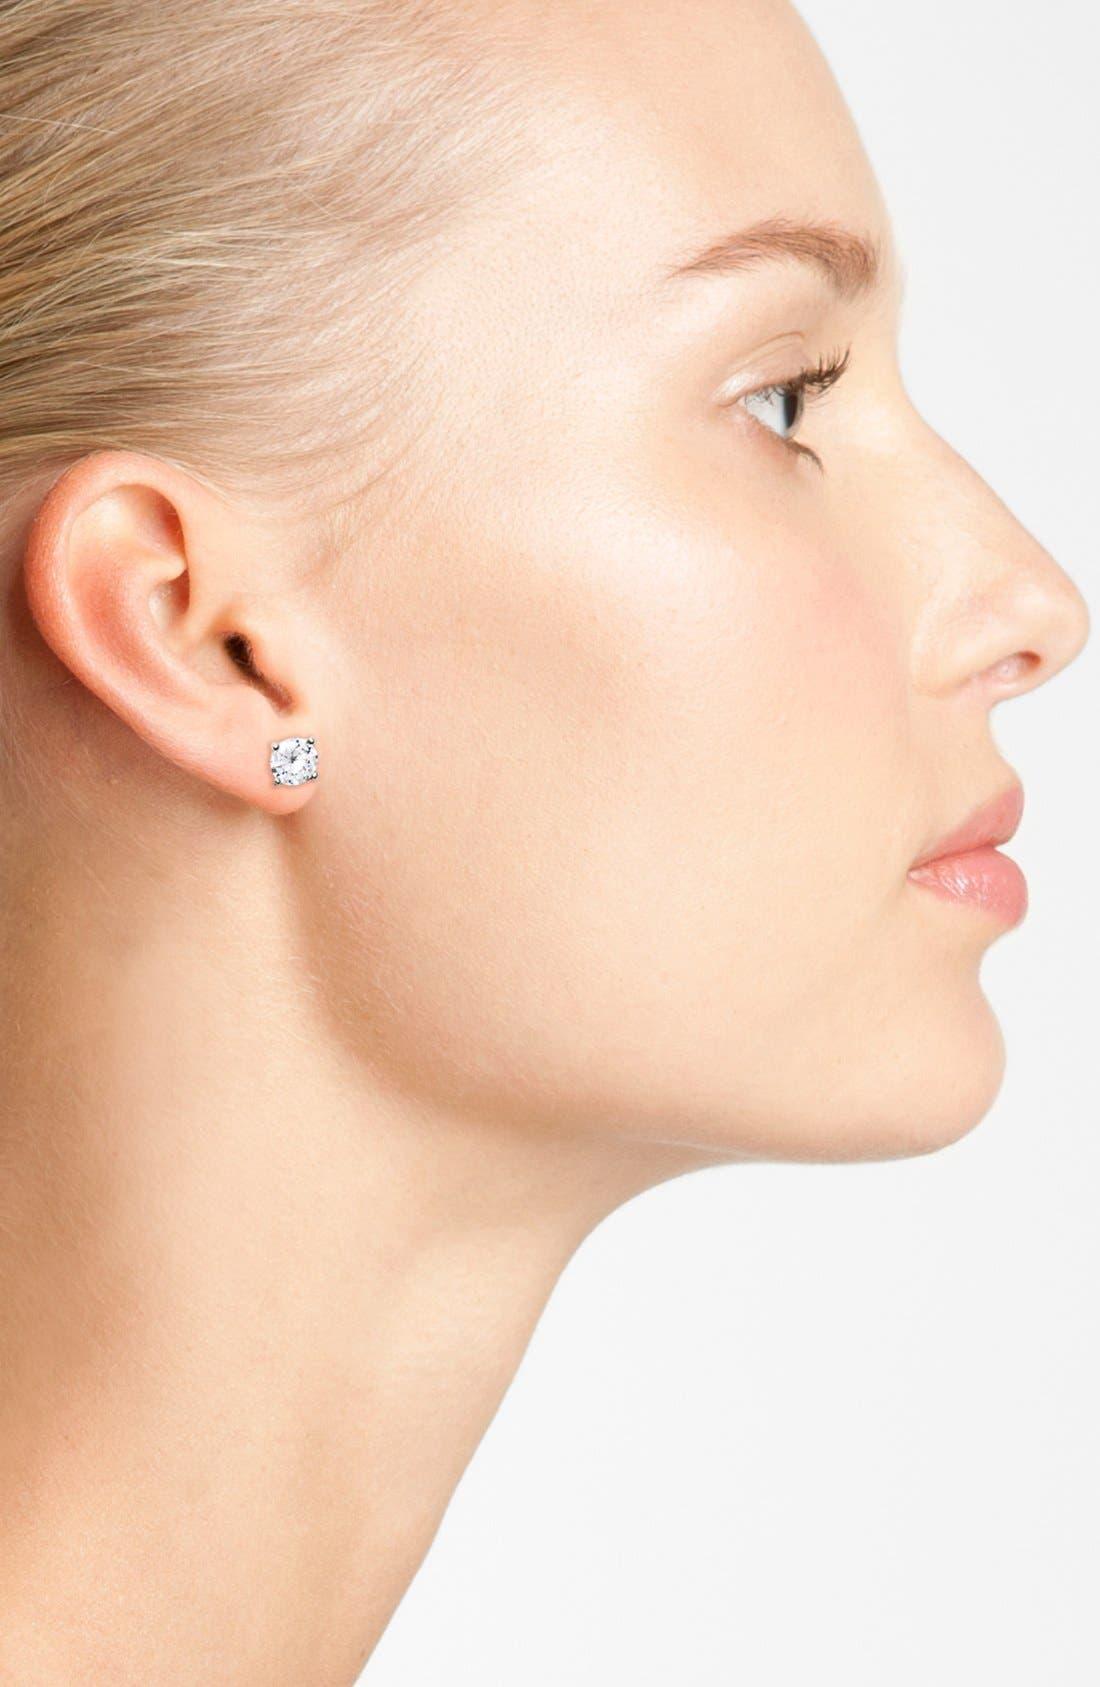 Crystal Stud Earrings,                             Alternate thumbnail 2, color,                             SILVER